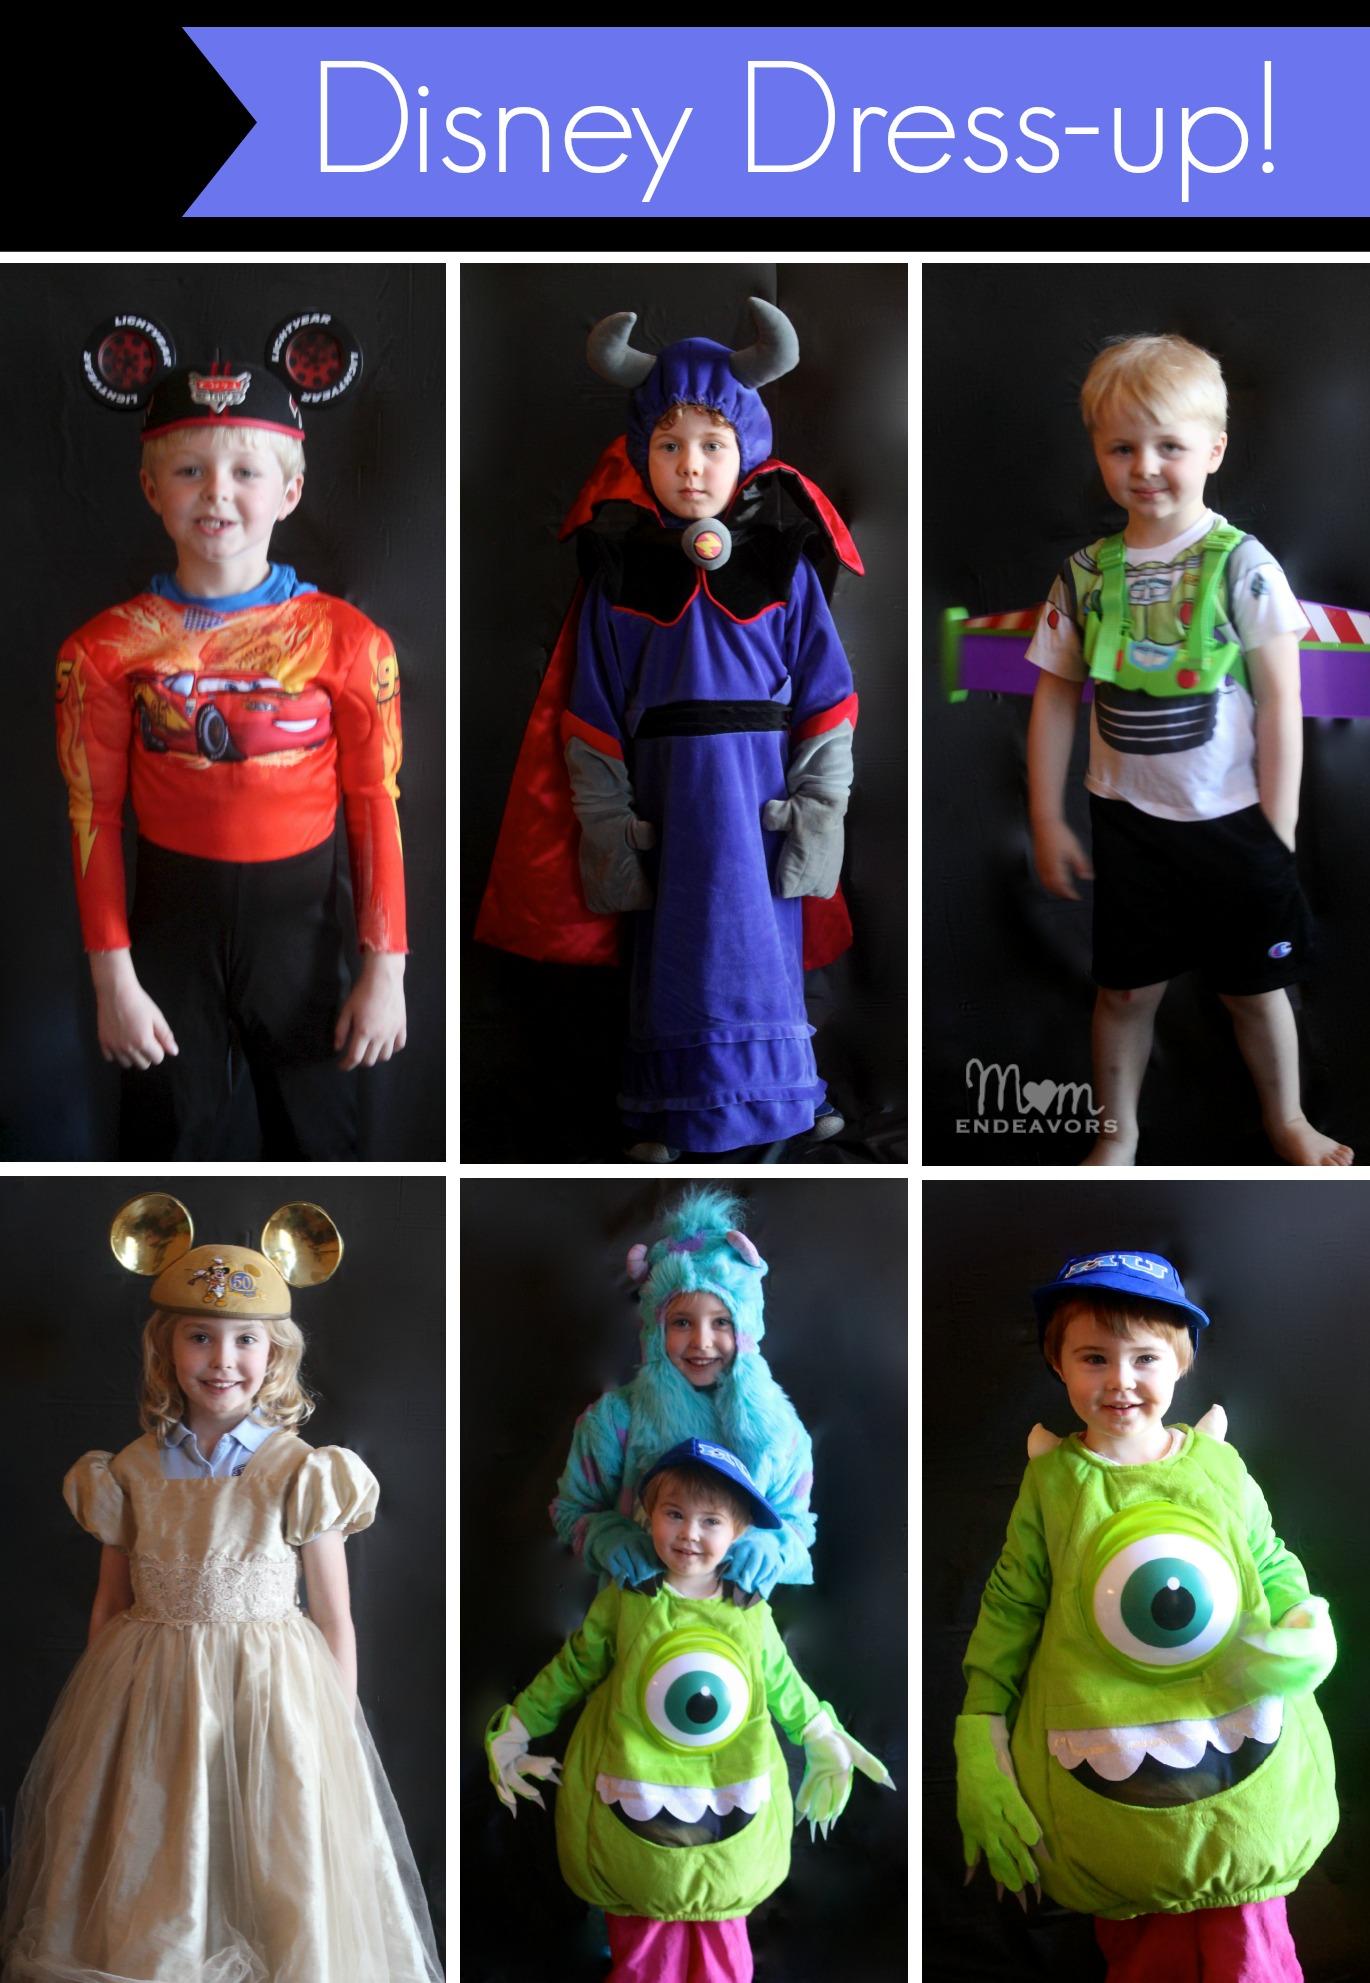 Disney Dress-up Photo Booth #Disneyside